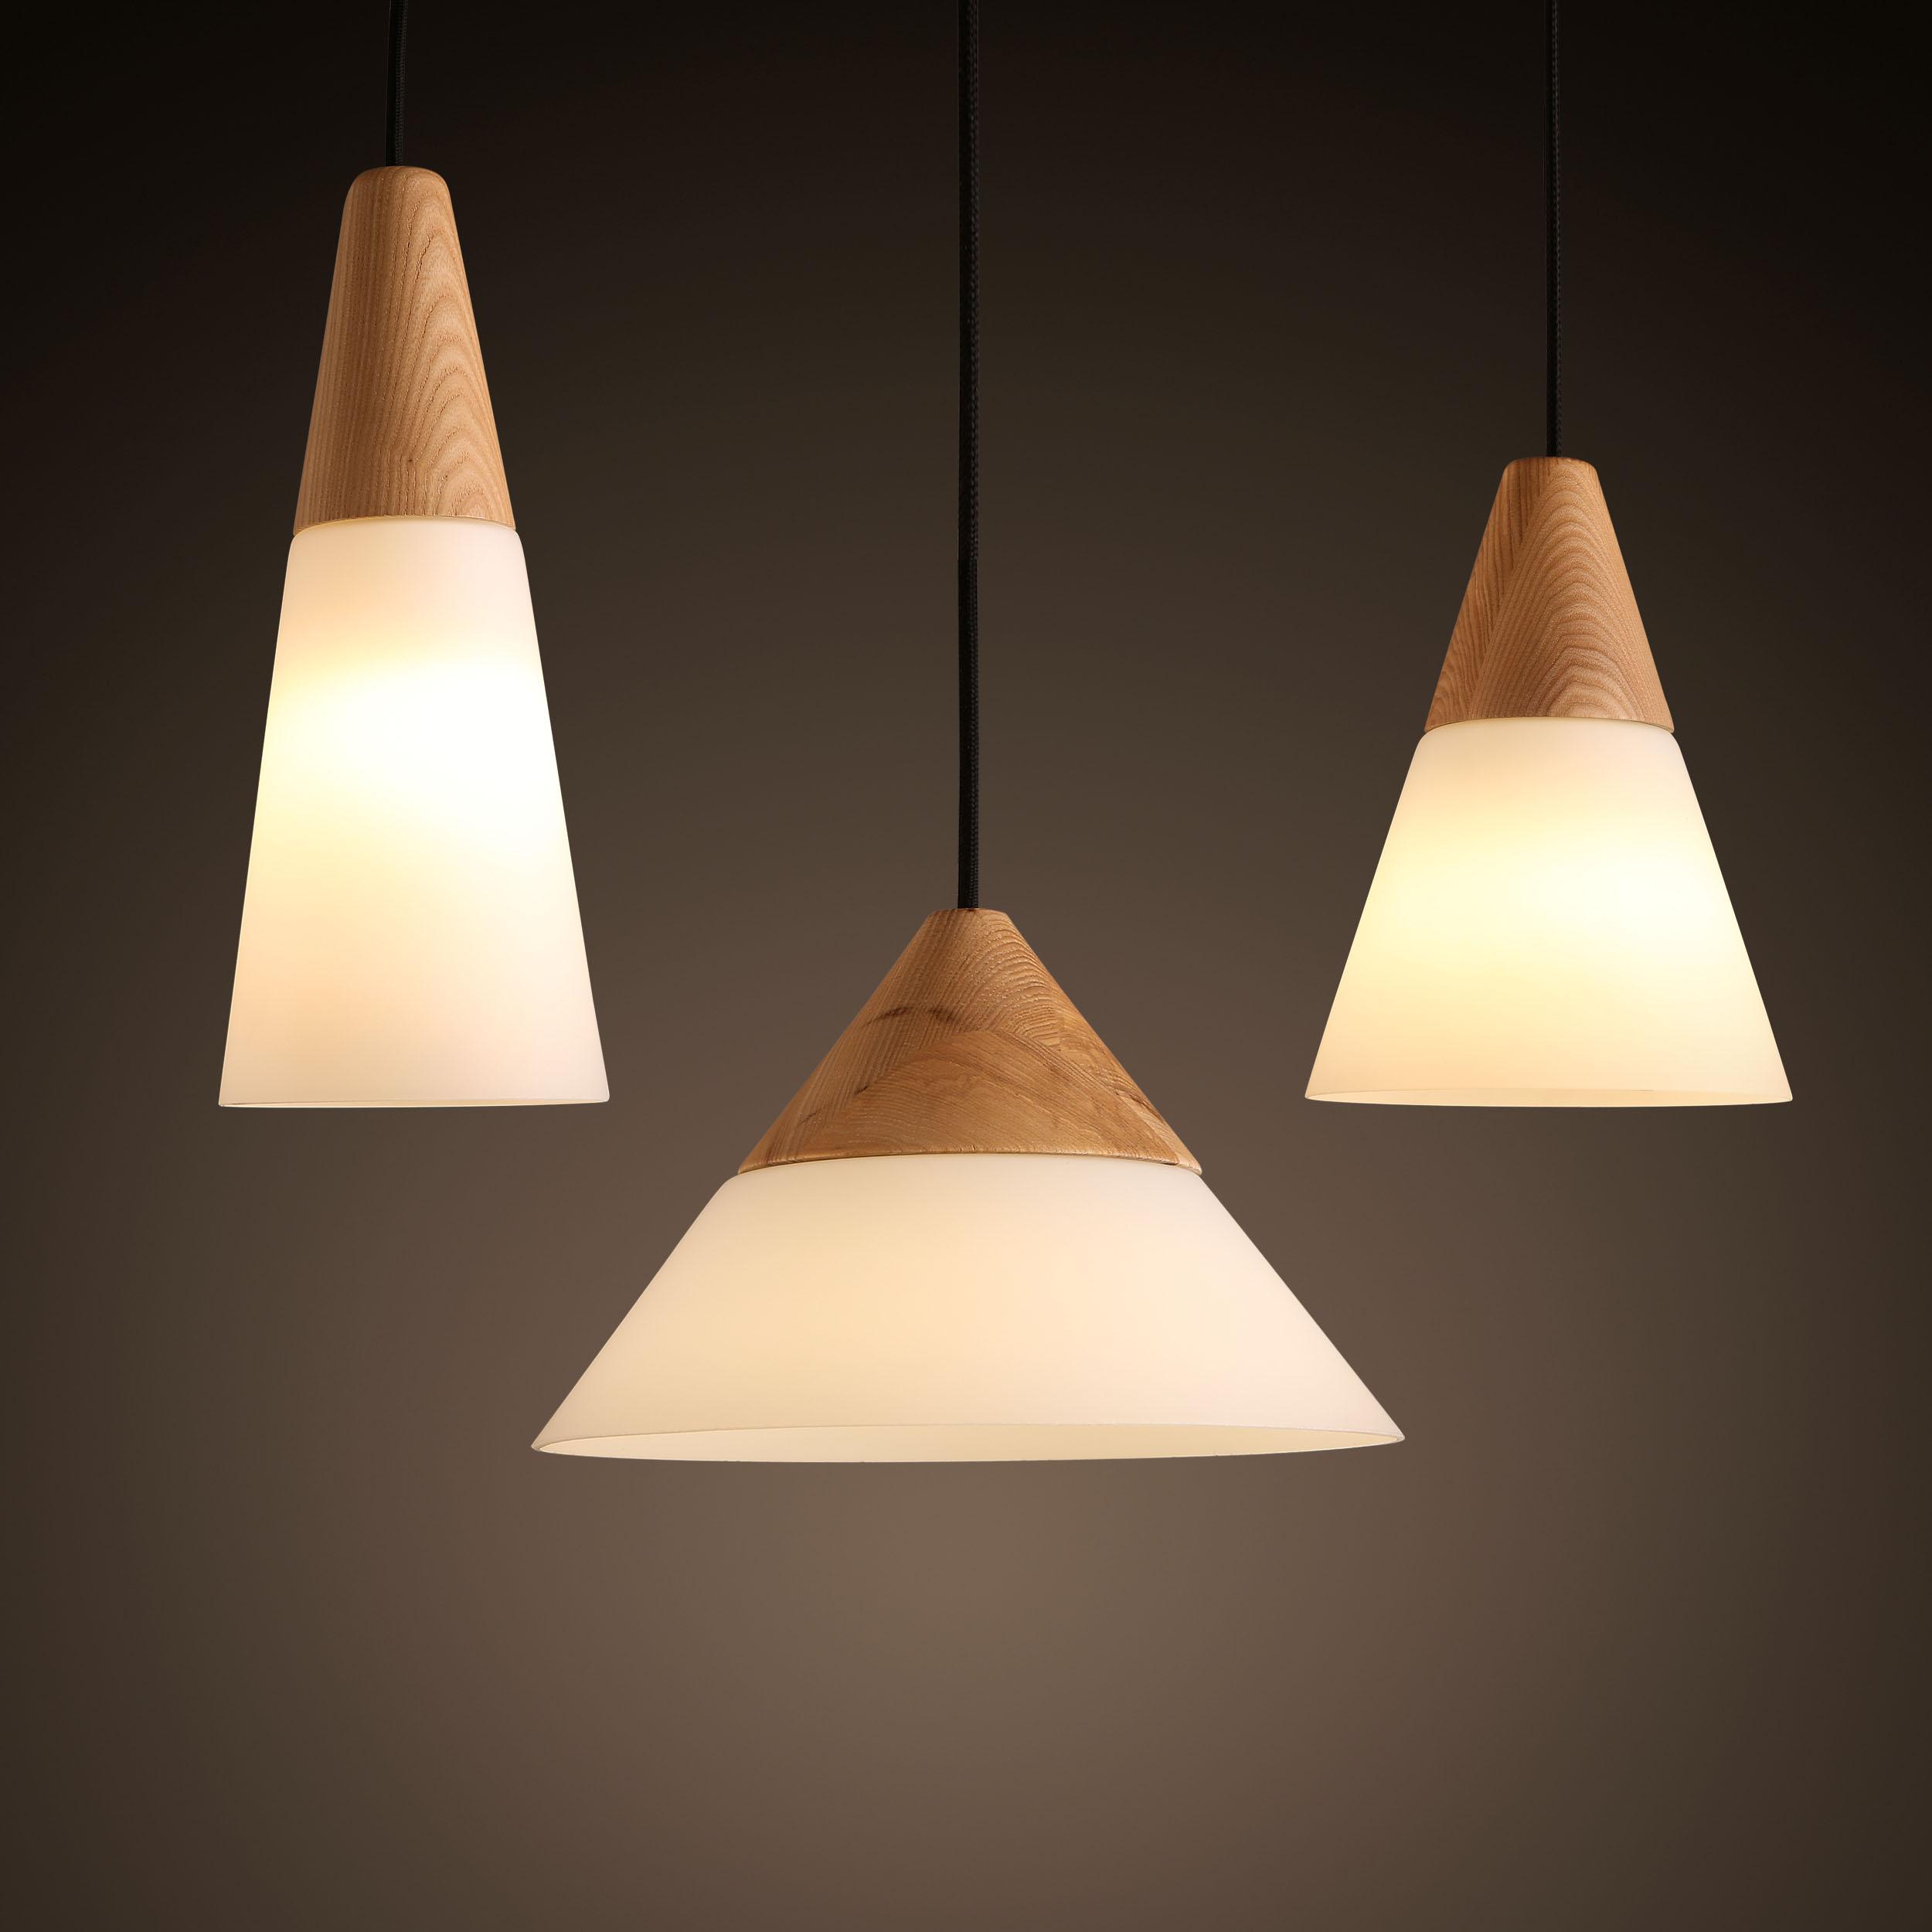 Stile provenzale shabby chic ikea - Cucina lampadari ...